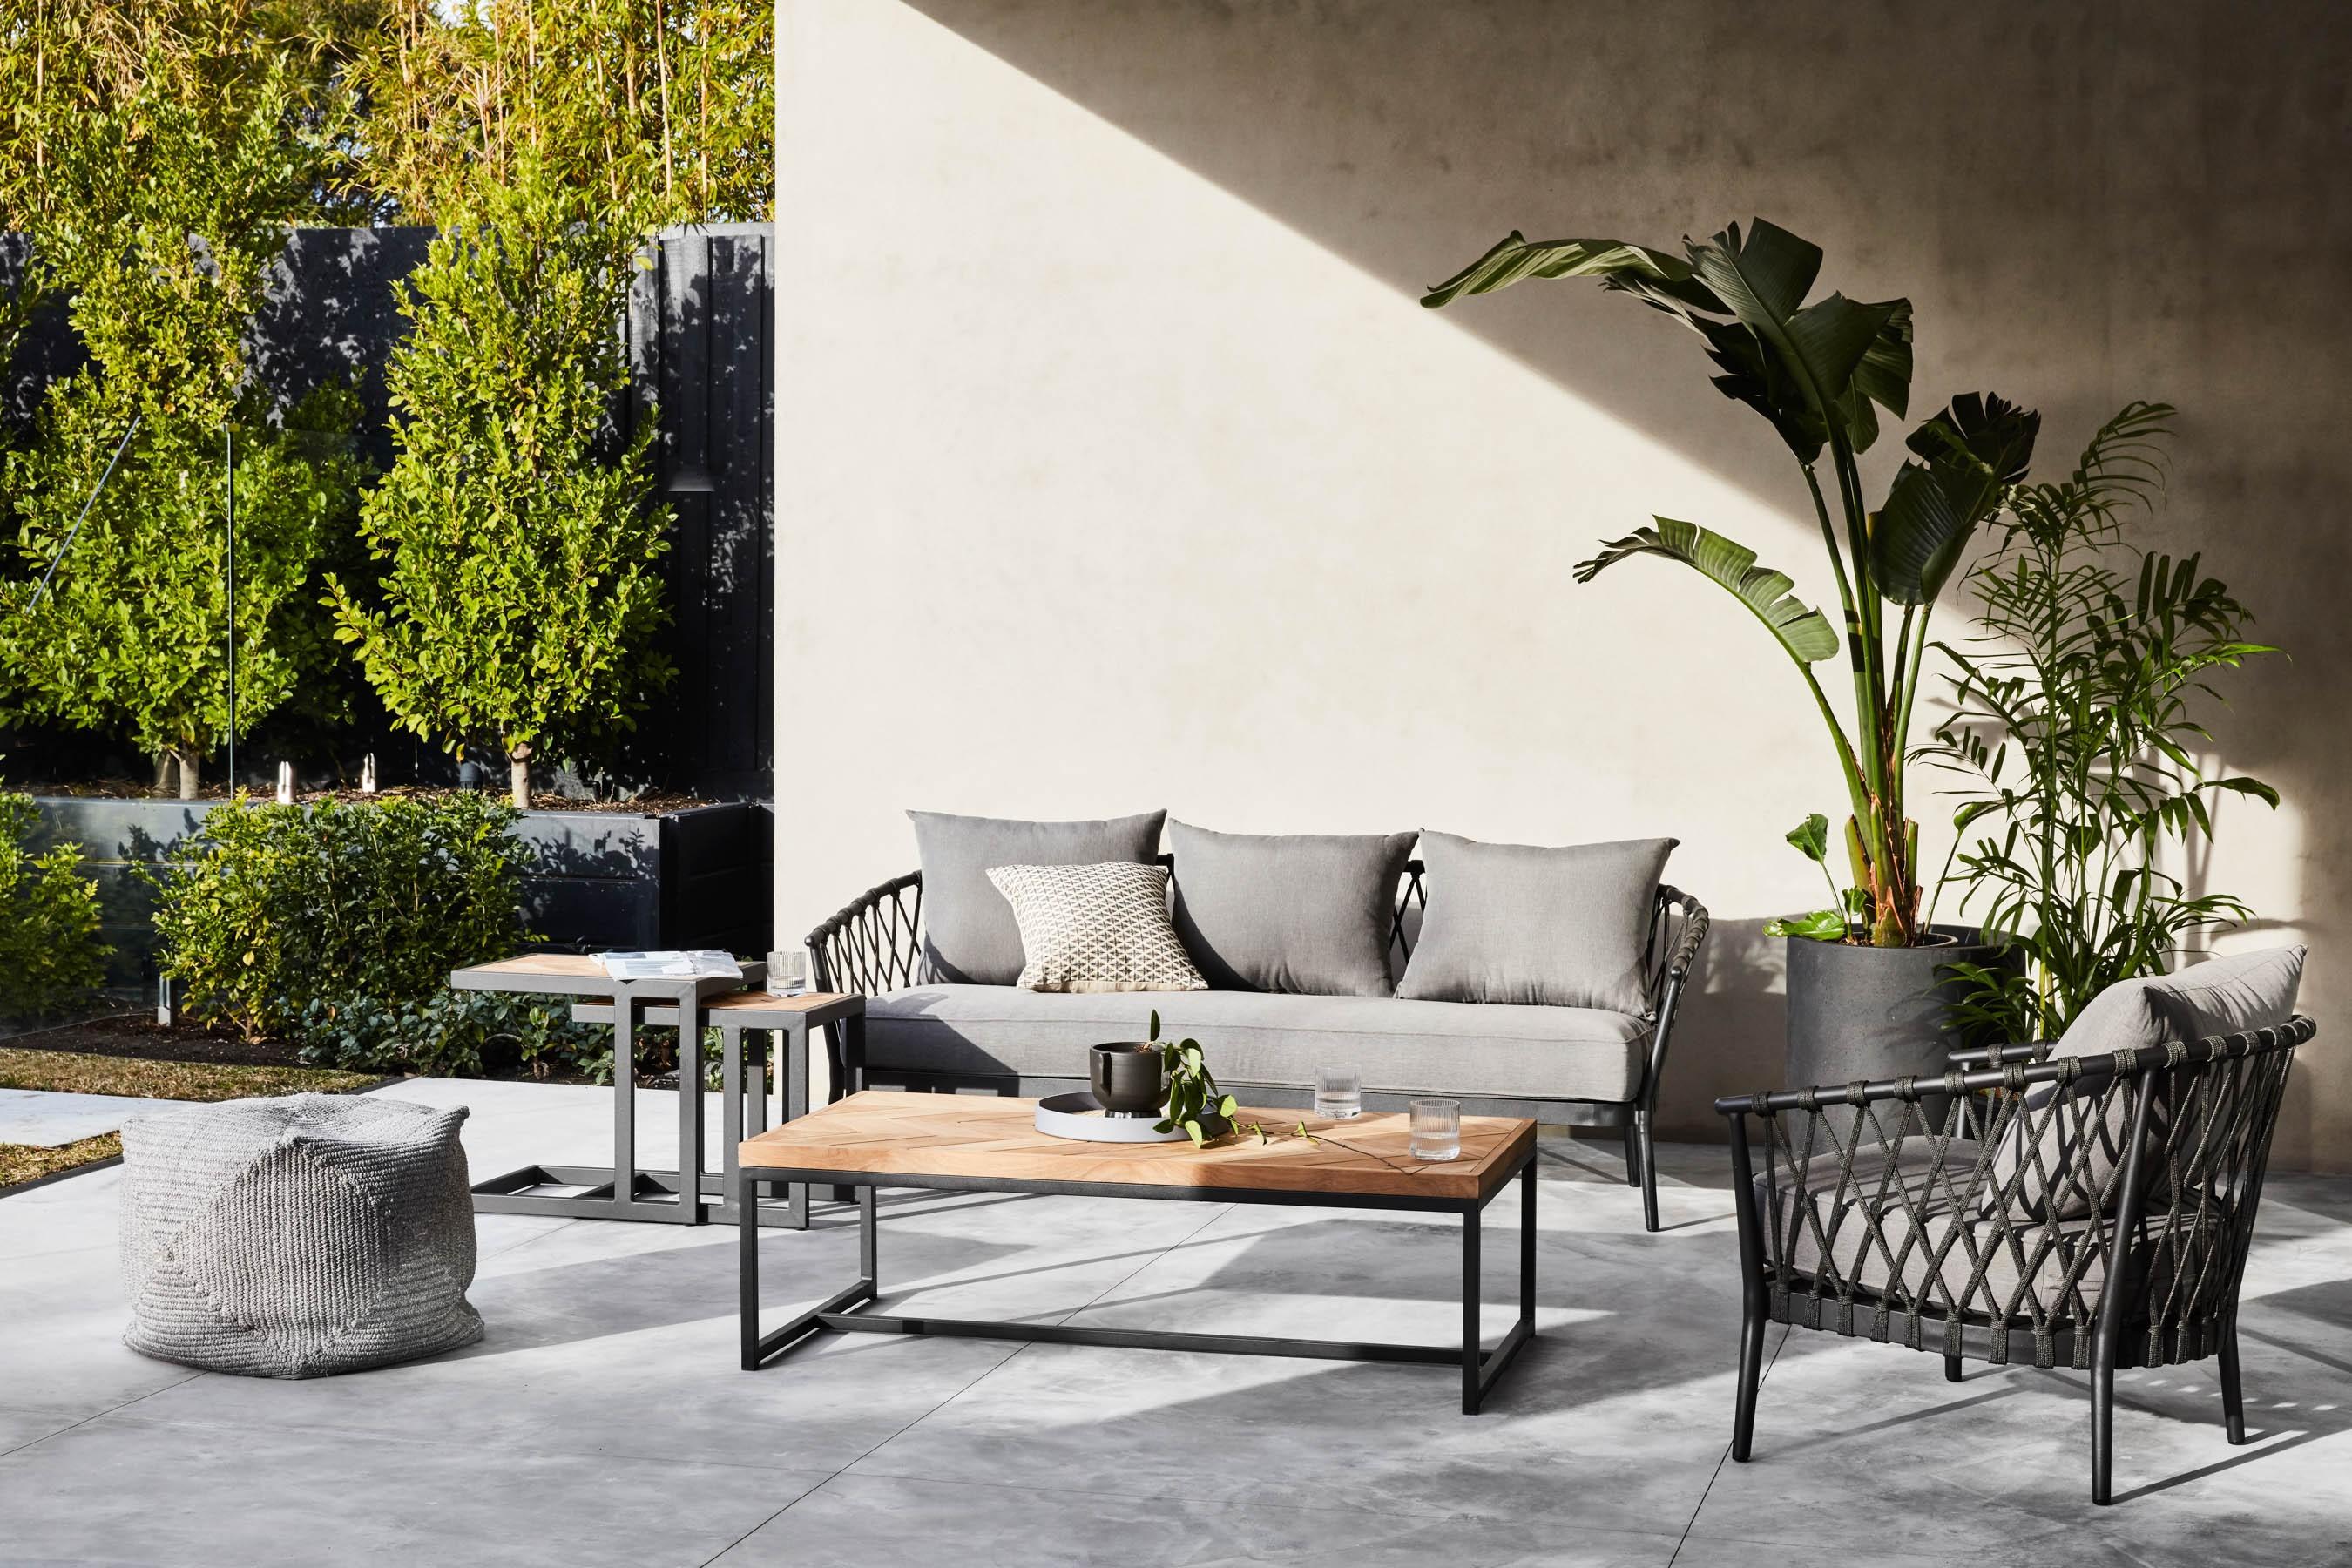 Furniture Gallery Sofas maui-one-seater-sofa-03